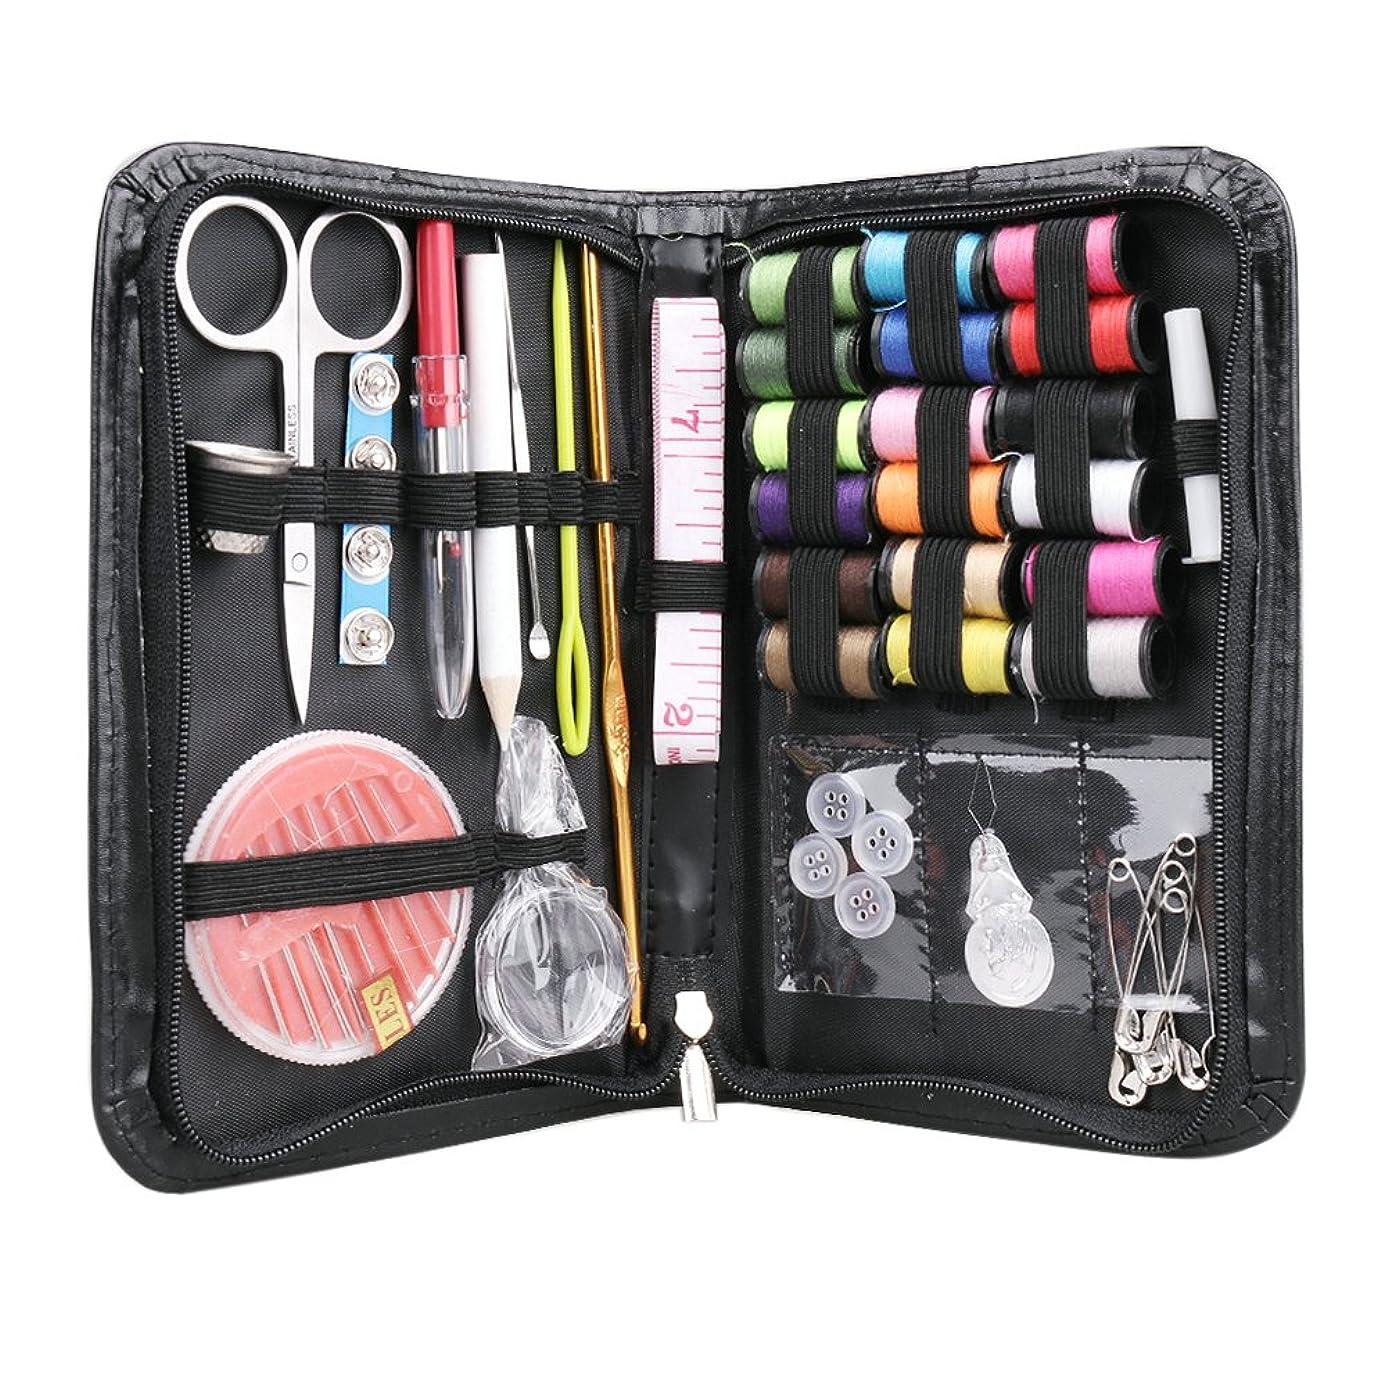 Ocean Sewing Kit, DIY & Emergency Clothing Repairs, Zipper Portable & Complete Mini Sew Kit for Traveller Adults Beginner, 43PCE